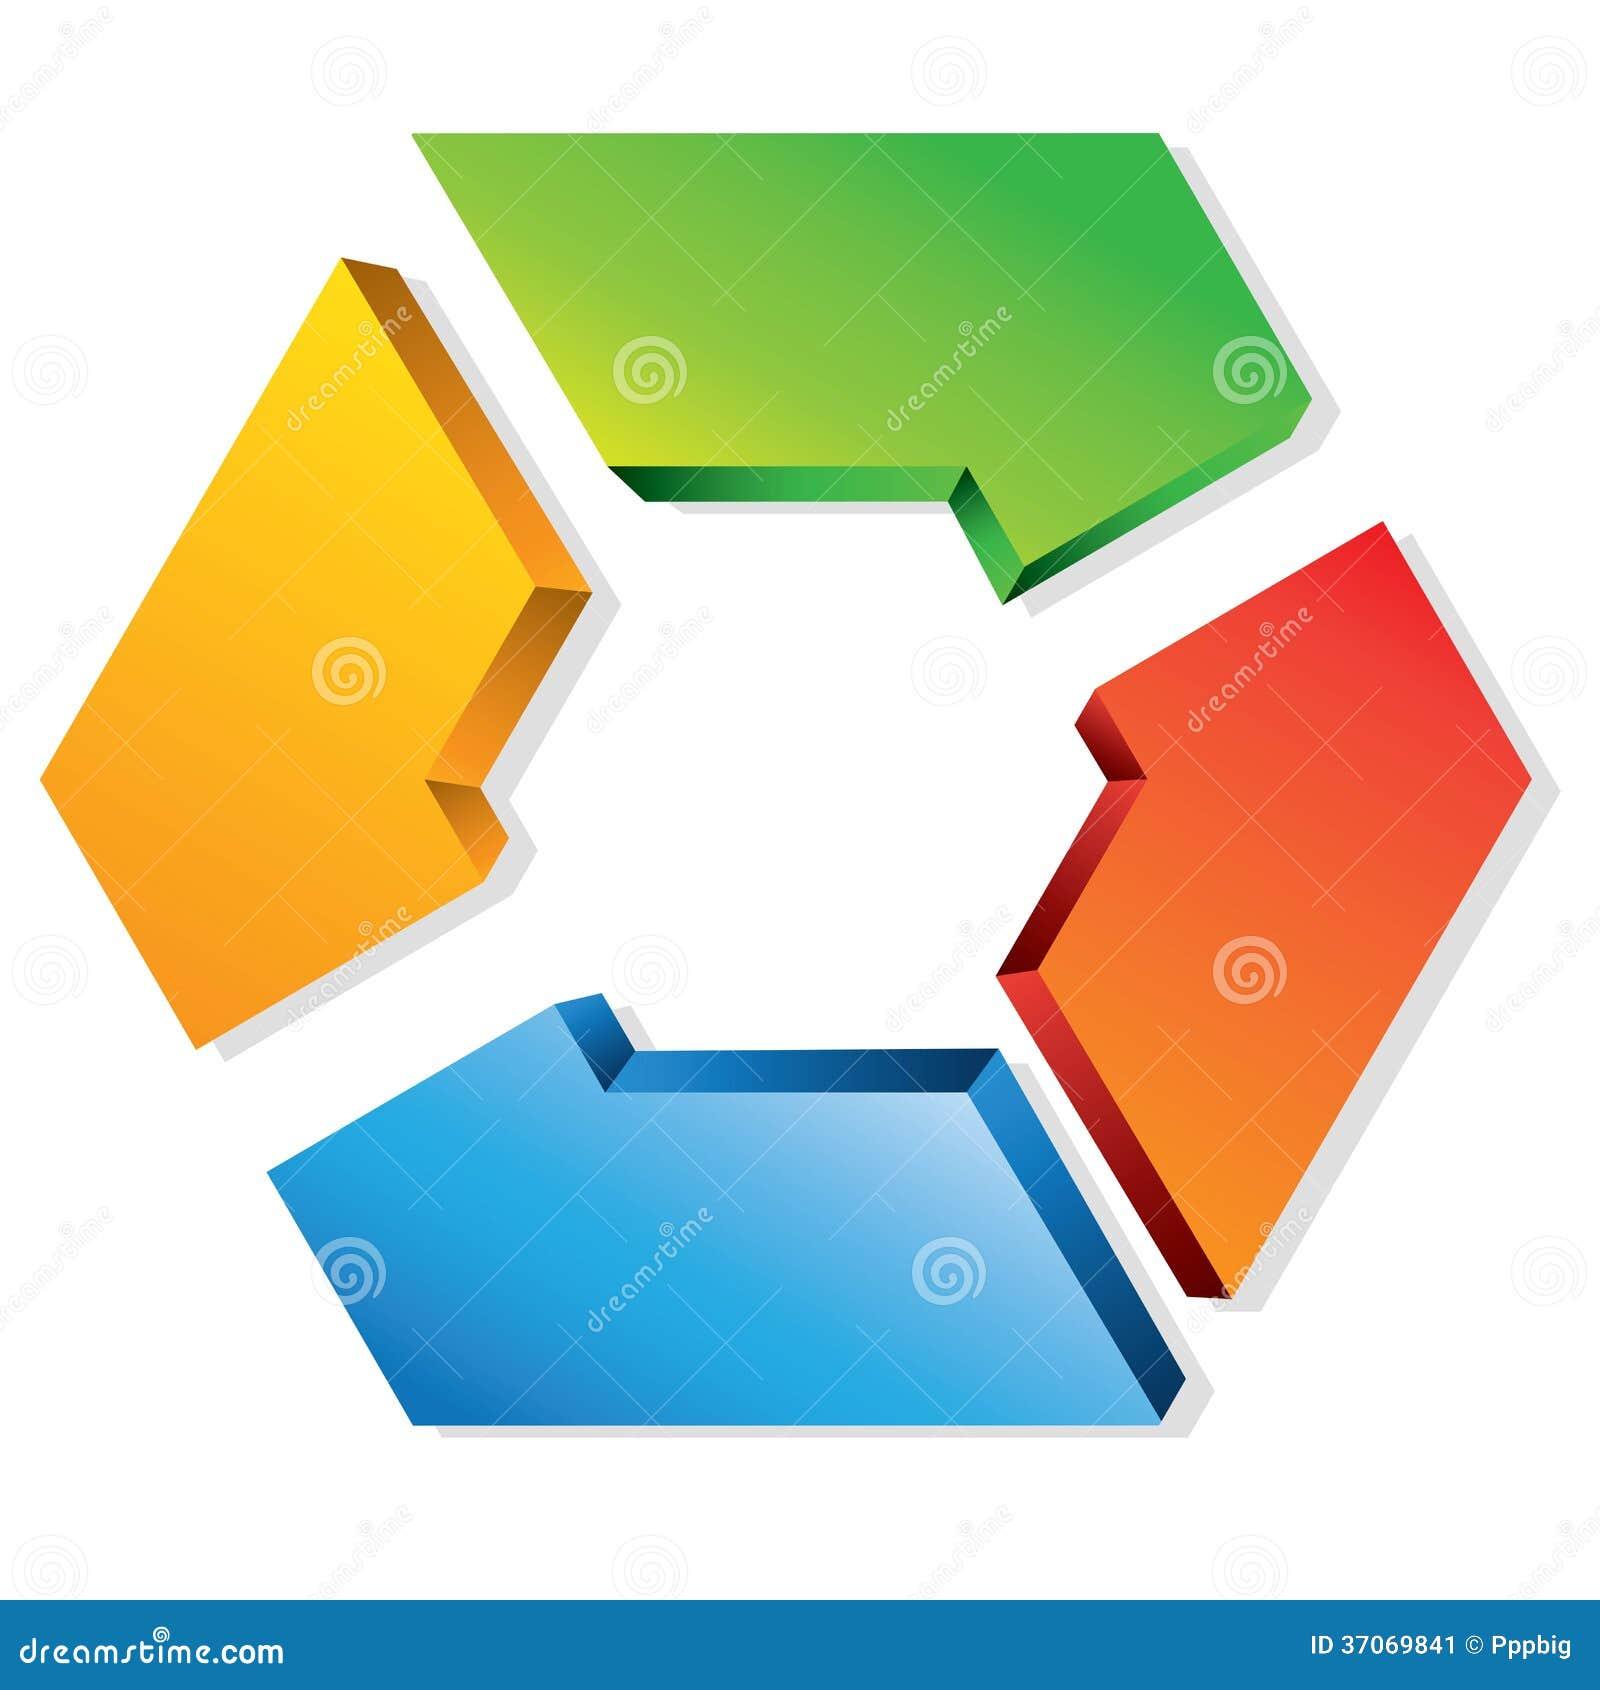 Hexagon loop diagram